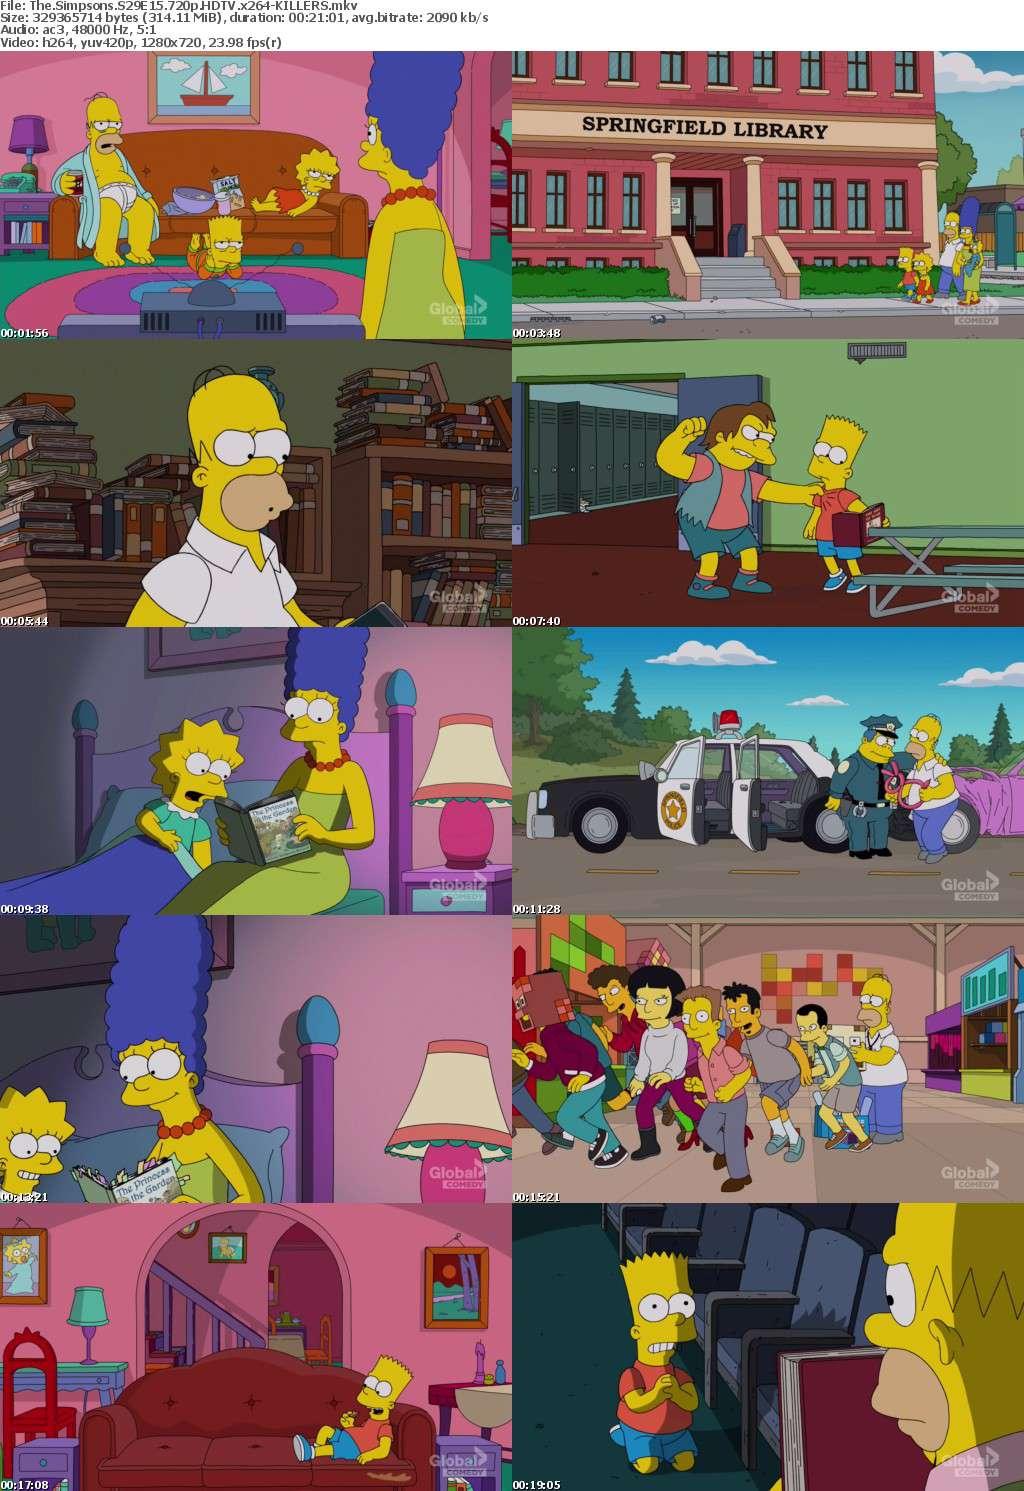 The Simpsons S29E15 720p HDTV x264-KILLERS